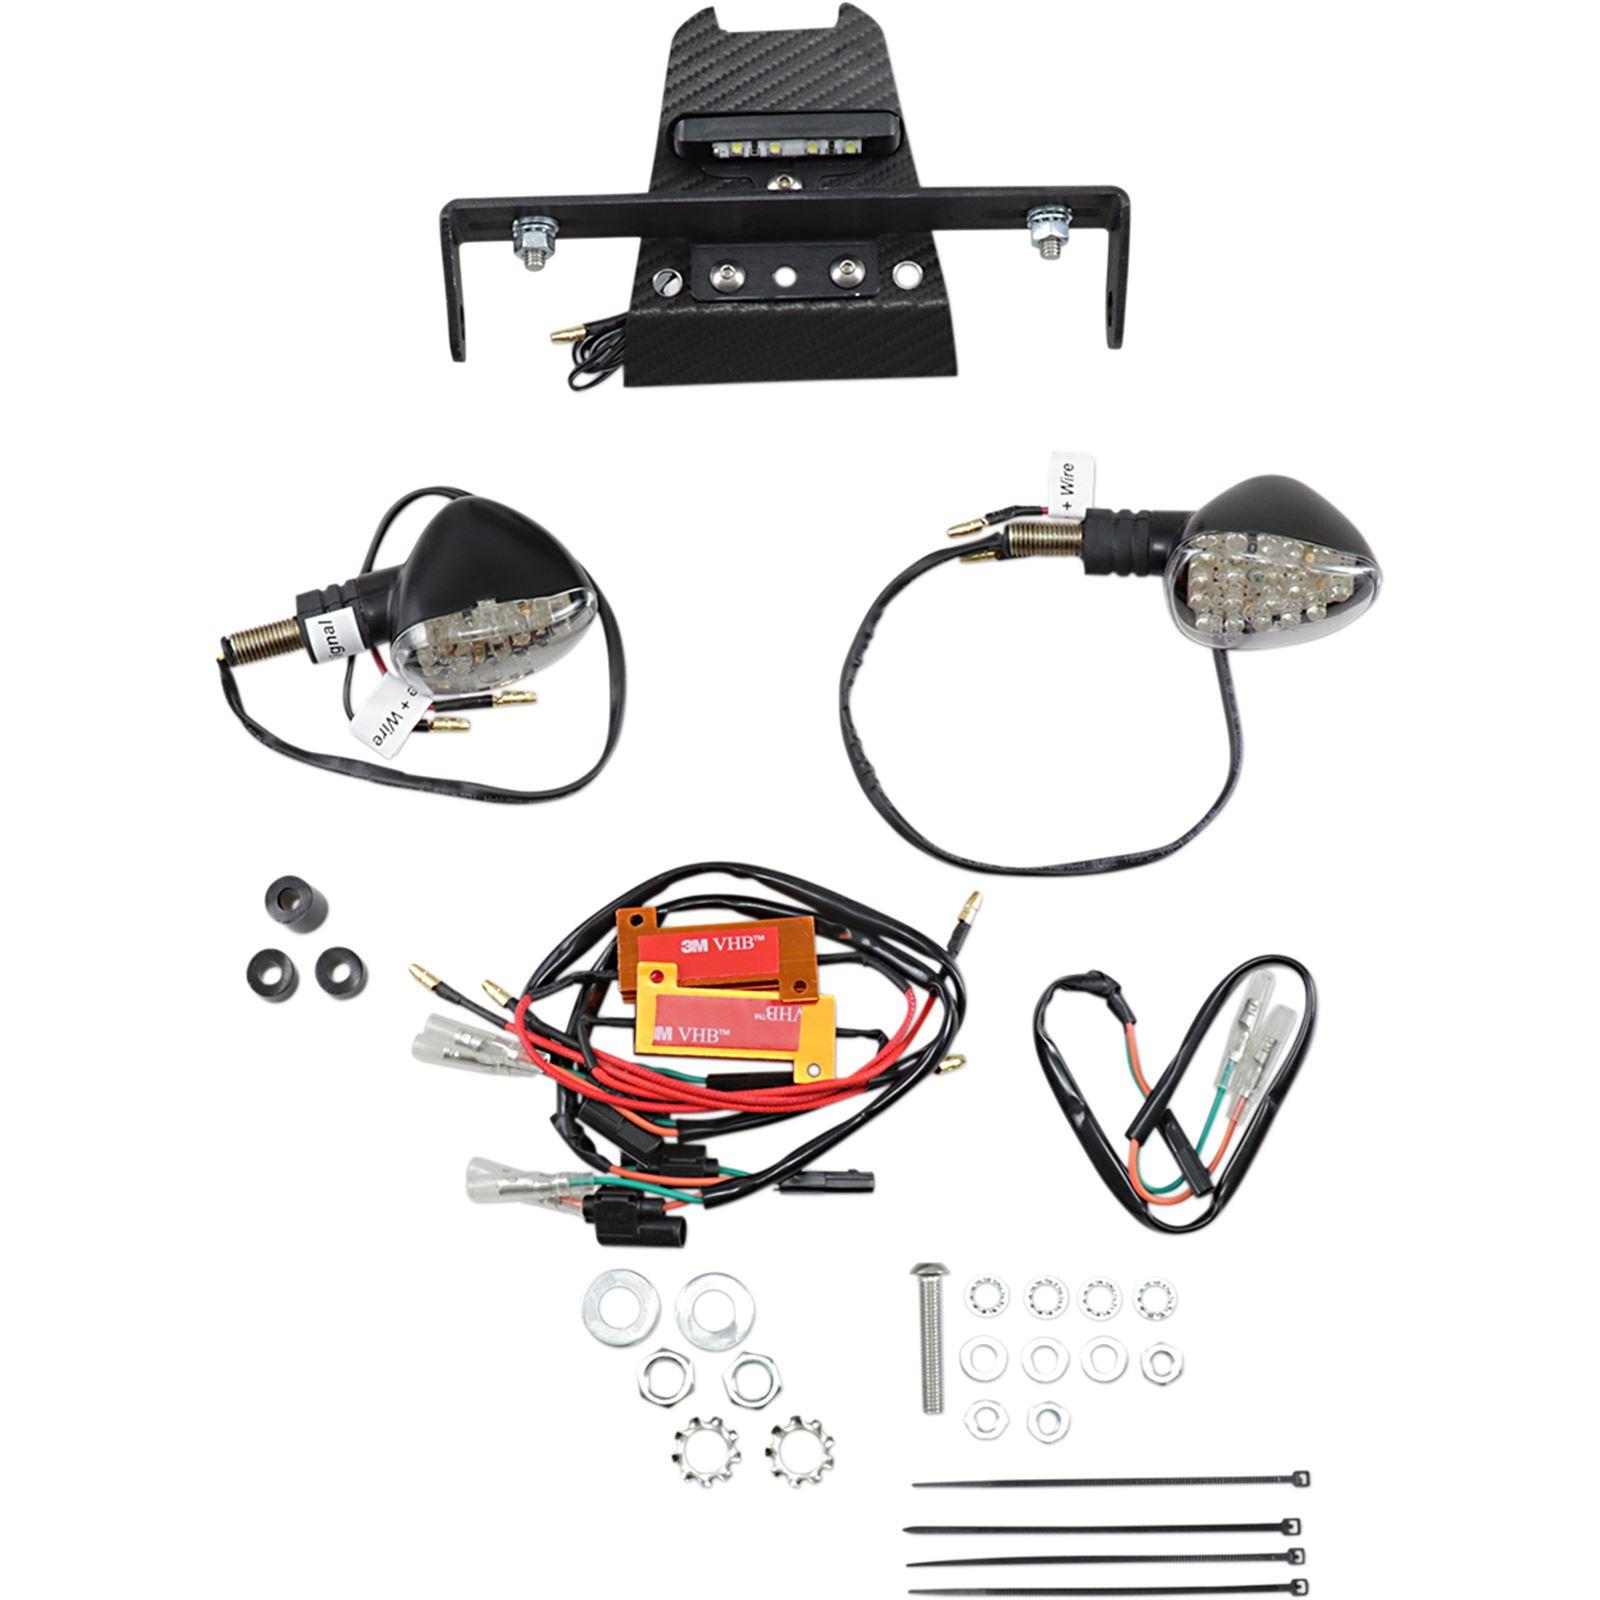 Targa Tail Kit with LED Signals - CBR650F '14-'16